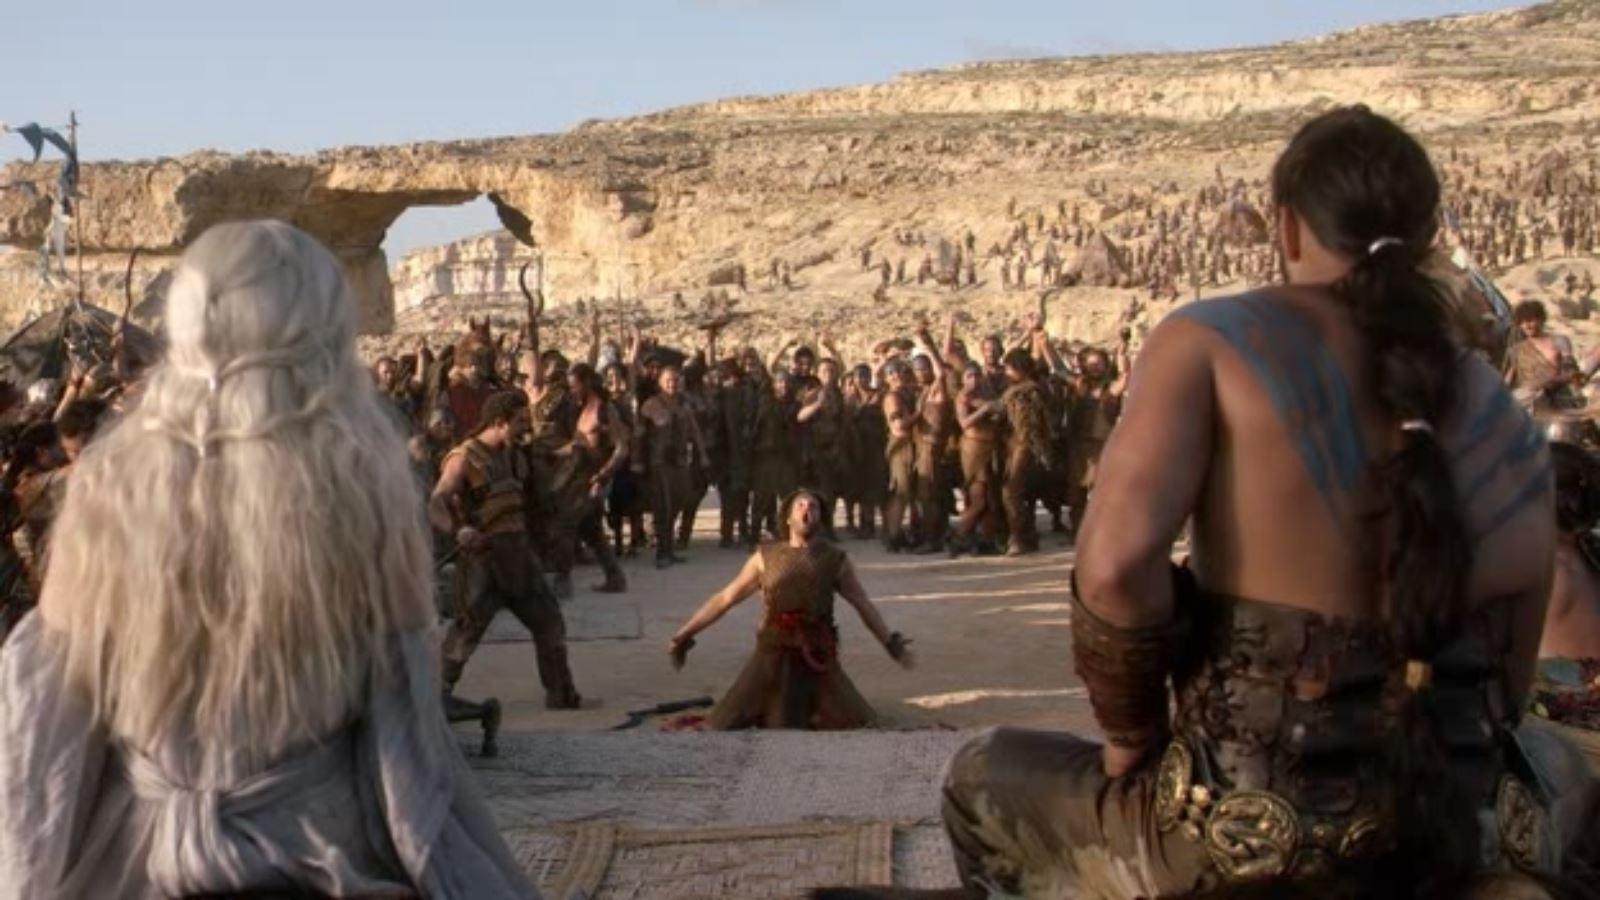 Dothraki Wedding Scene - Less than three deaths at a Dothraki wedding is considered dull., remember